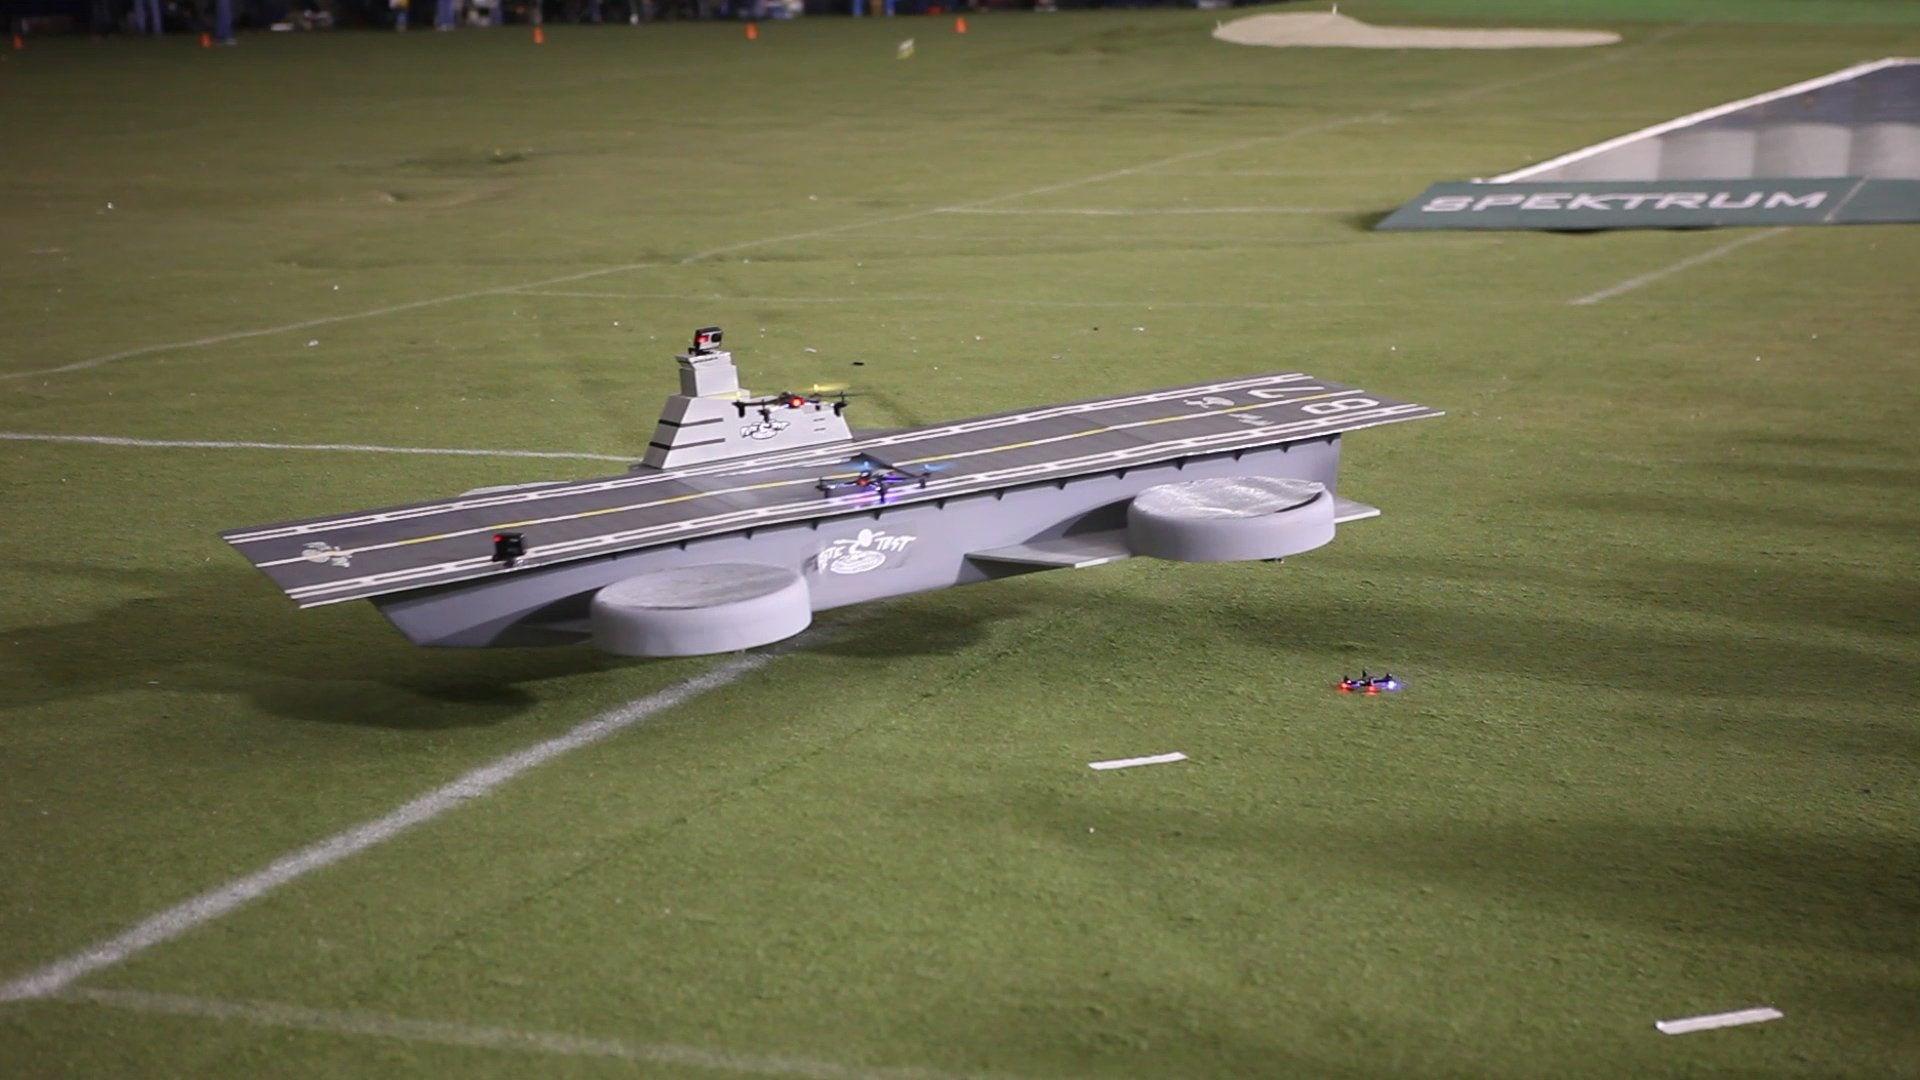 heli-carrier-overview-multicam-00-02-01-04-still004-jpg 1421250694